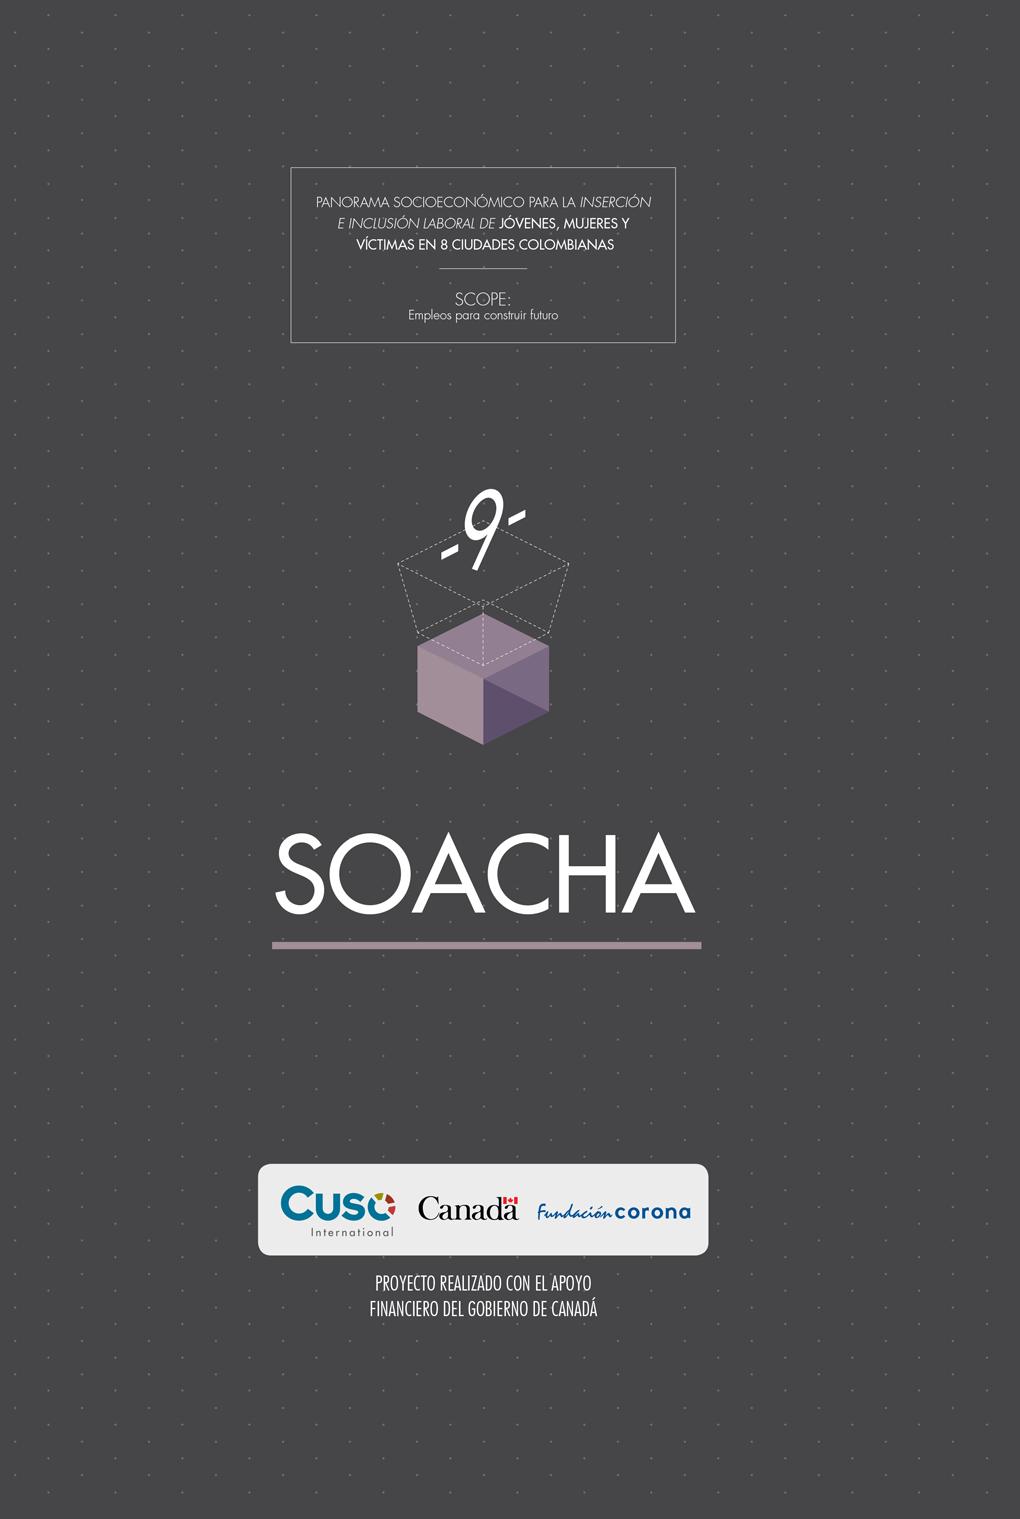 Panorama socioeconómico Soacha